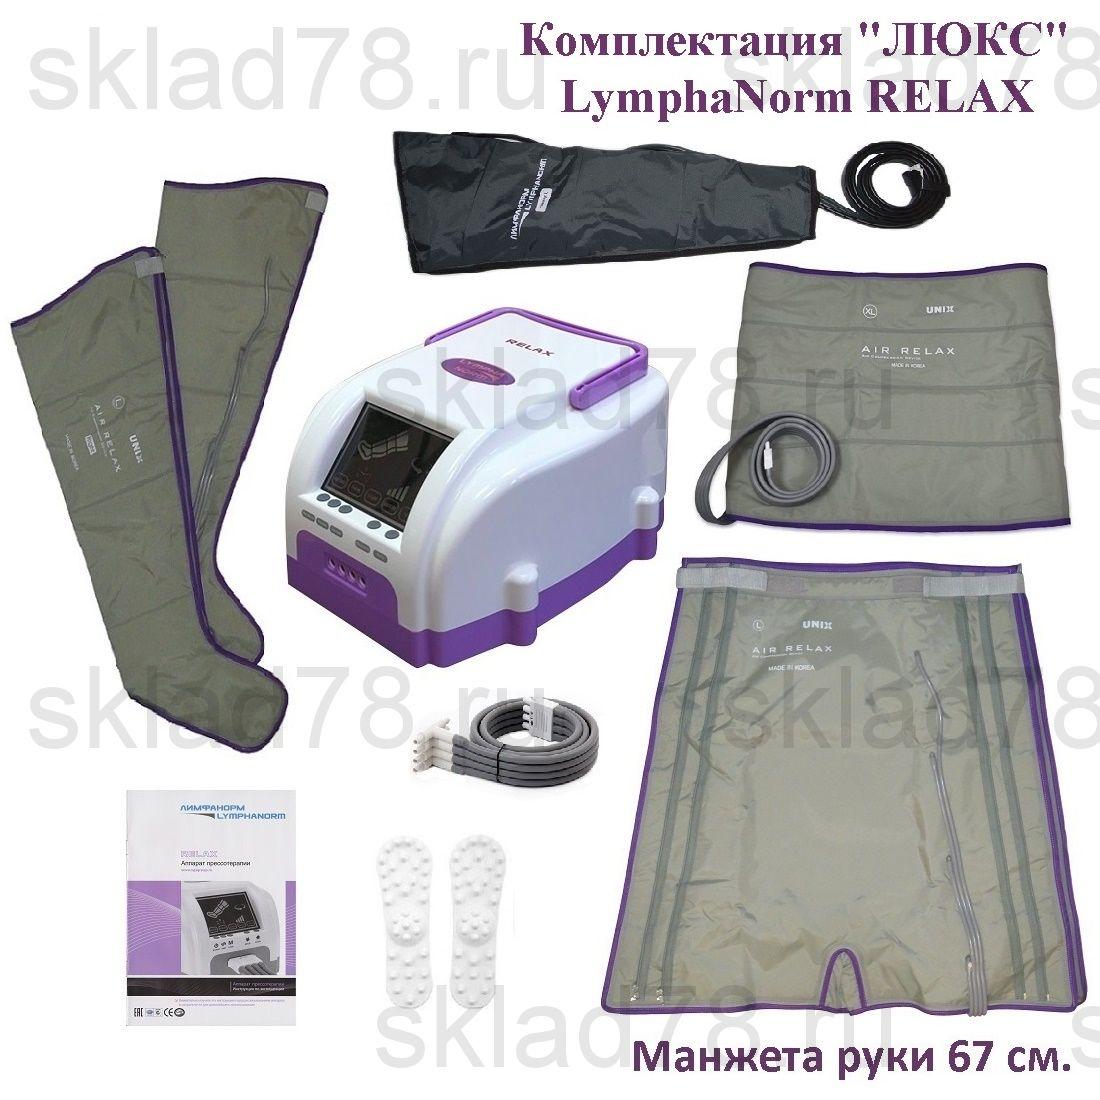 "LymphaNorm RELAX Лимфодренаж ""ЛЮКС"" (рука 67 см.)"